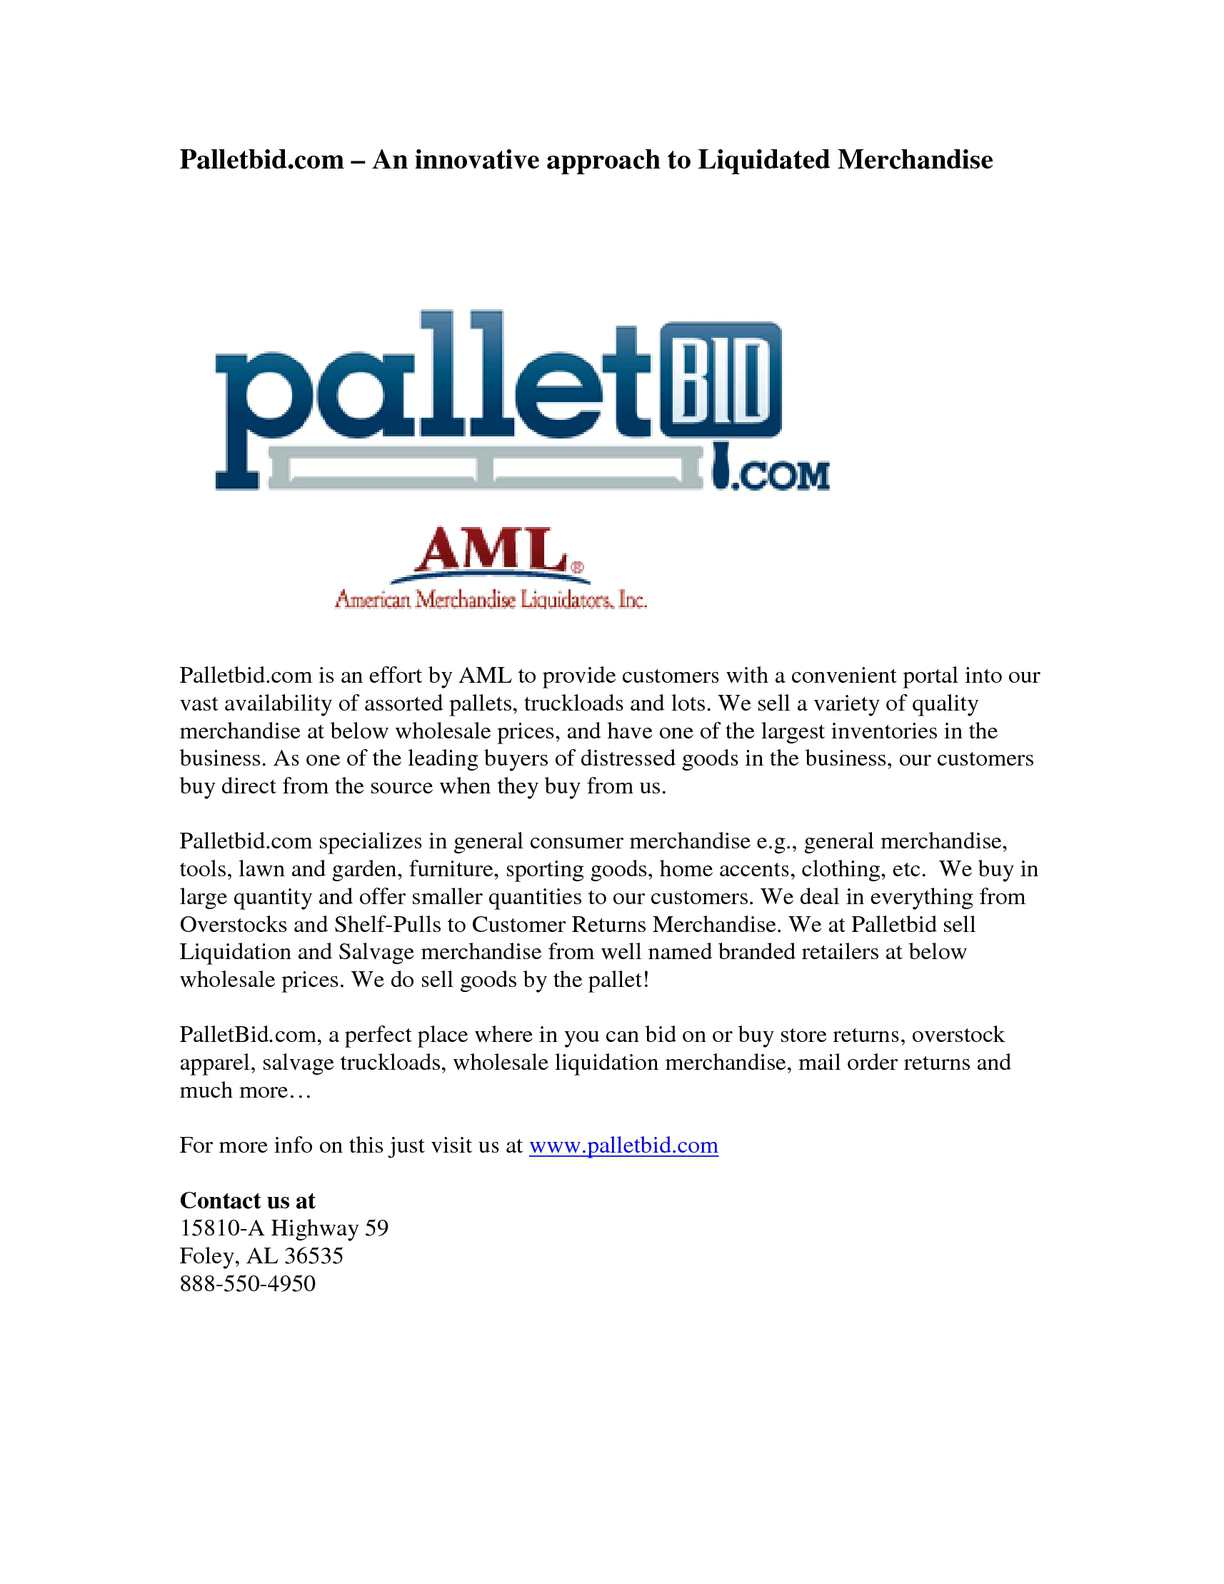 Calaméo - Palletbid com – An innovative approach to